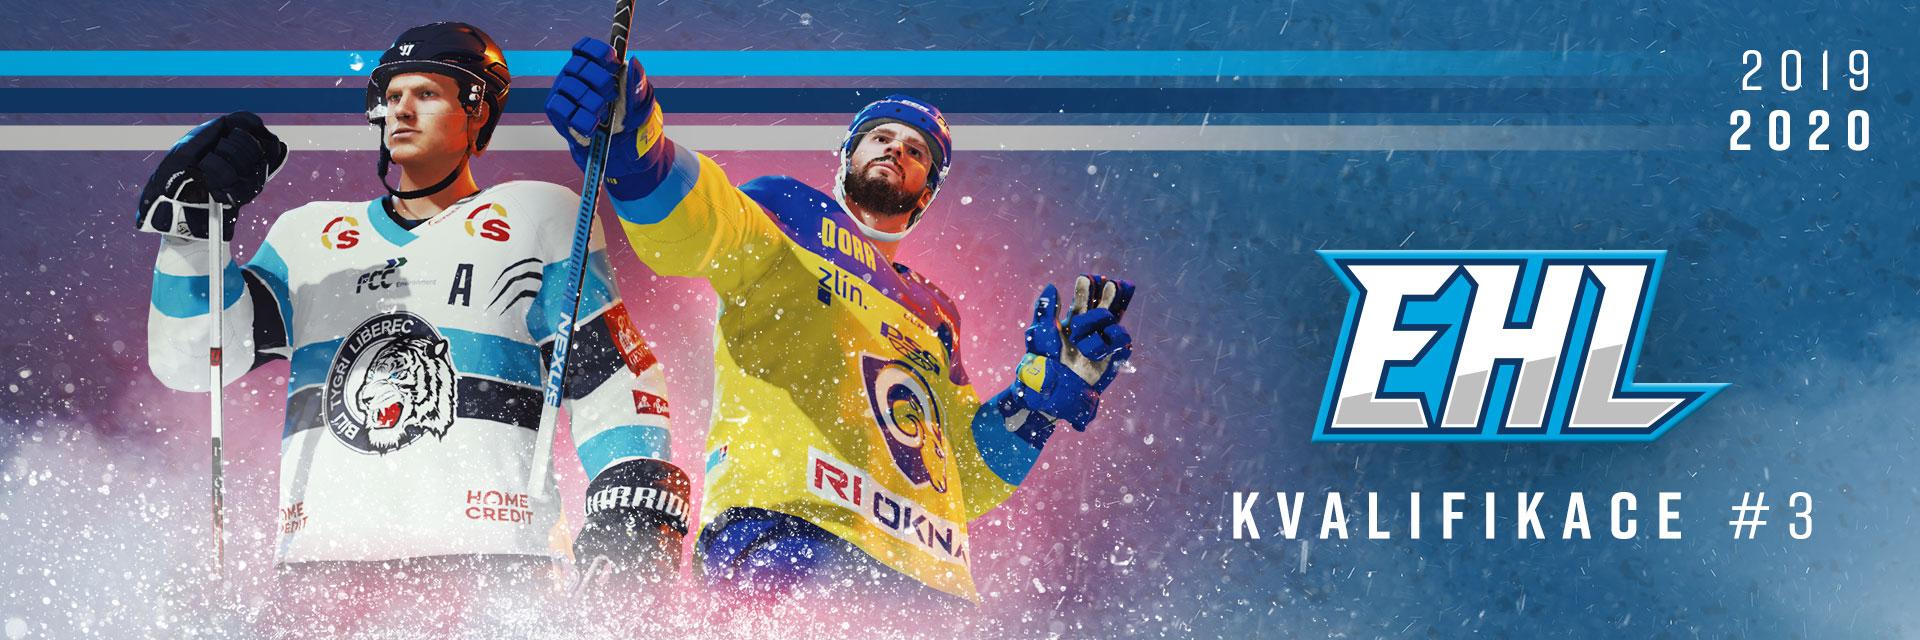 esport-hokejova-liga-kvalifikace-3